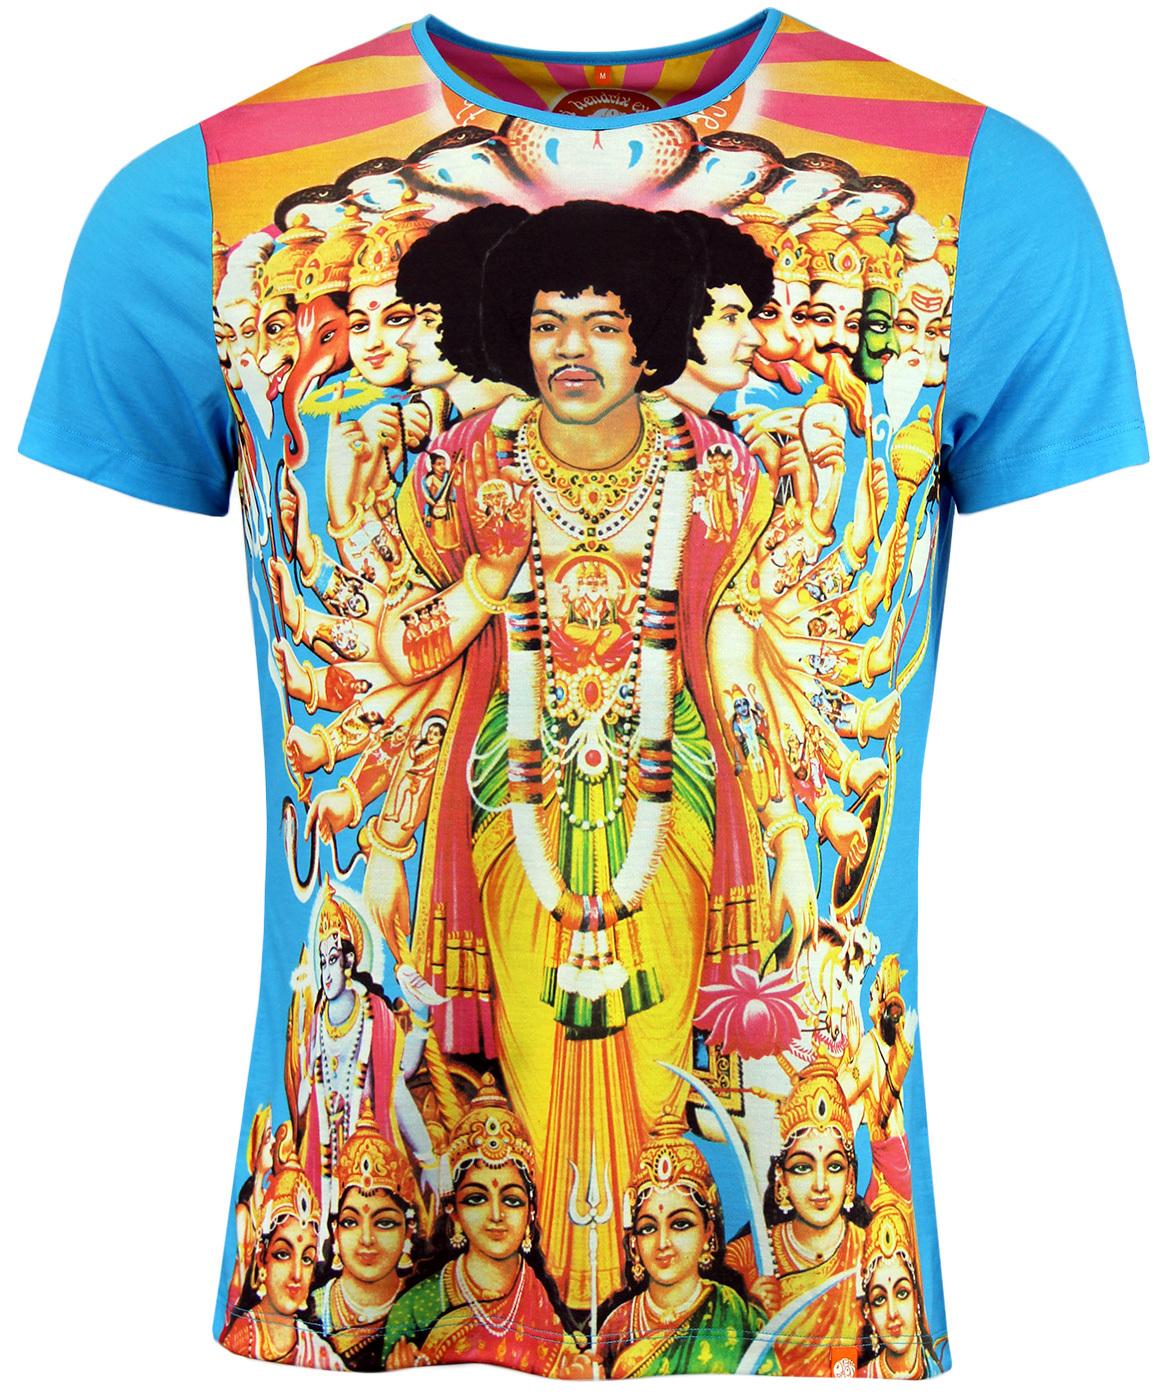 fd3c5b522de PRETTY GREEN Axis Jimi Hendrix Retro Psychedelic Tee in Blue